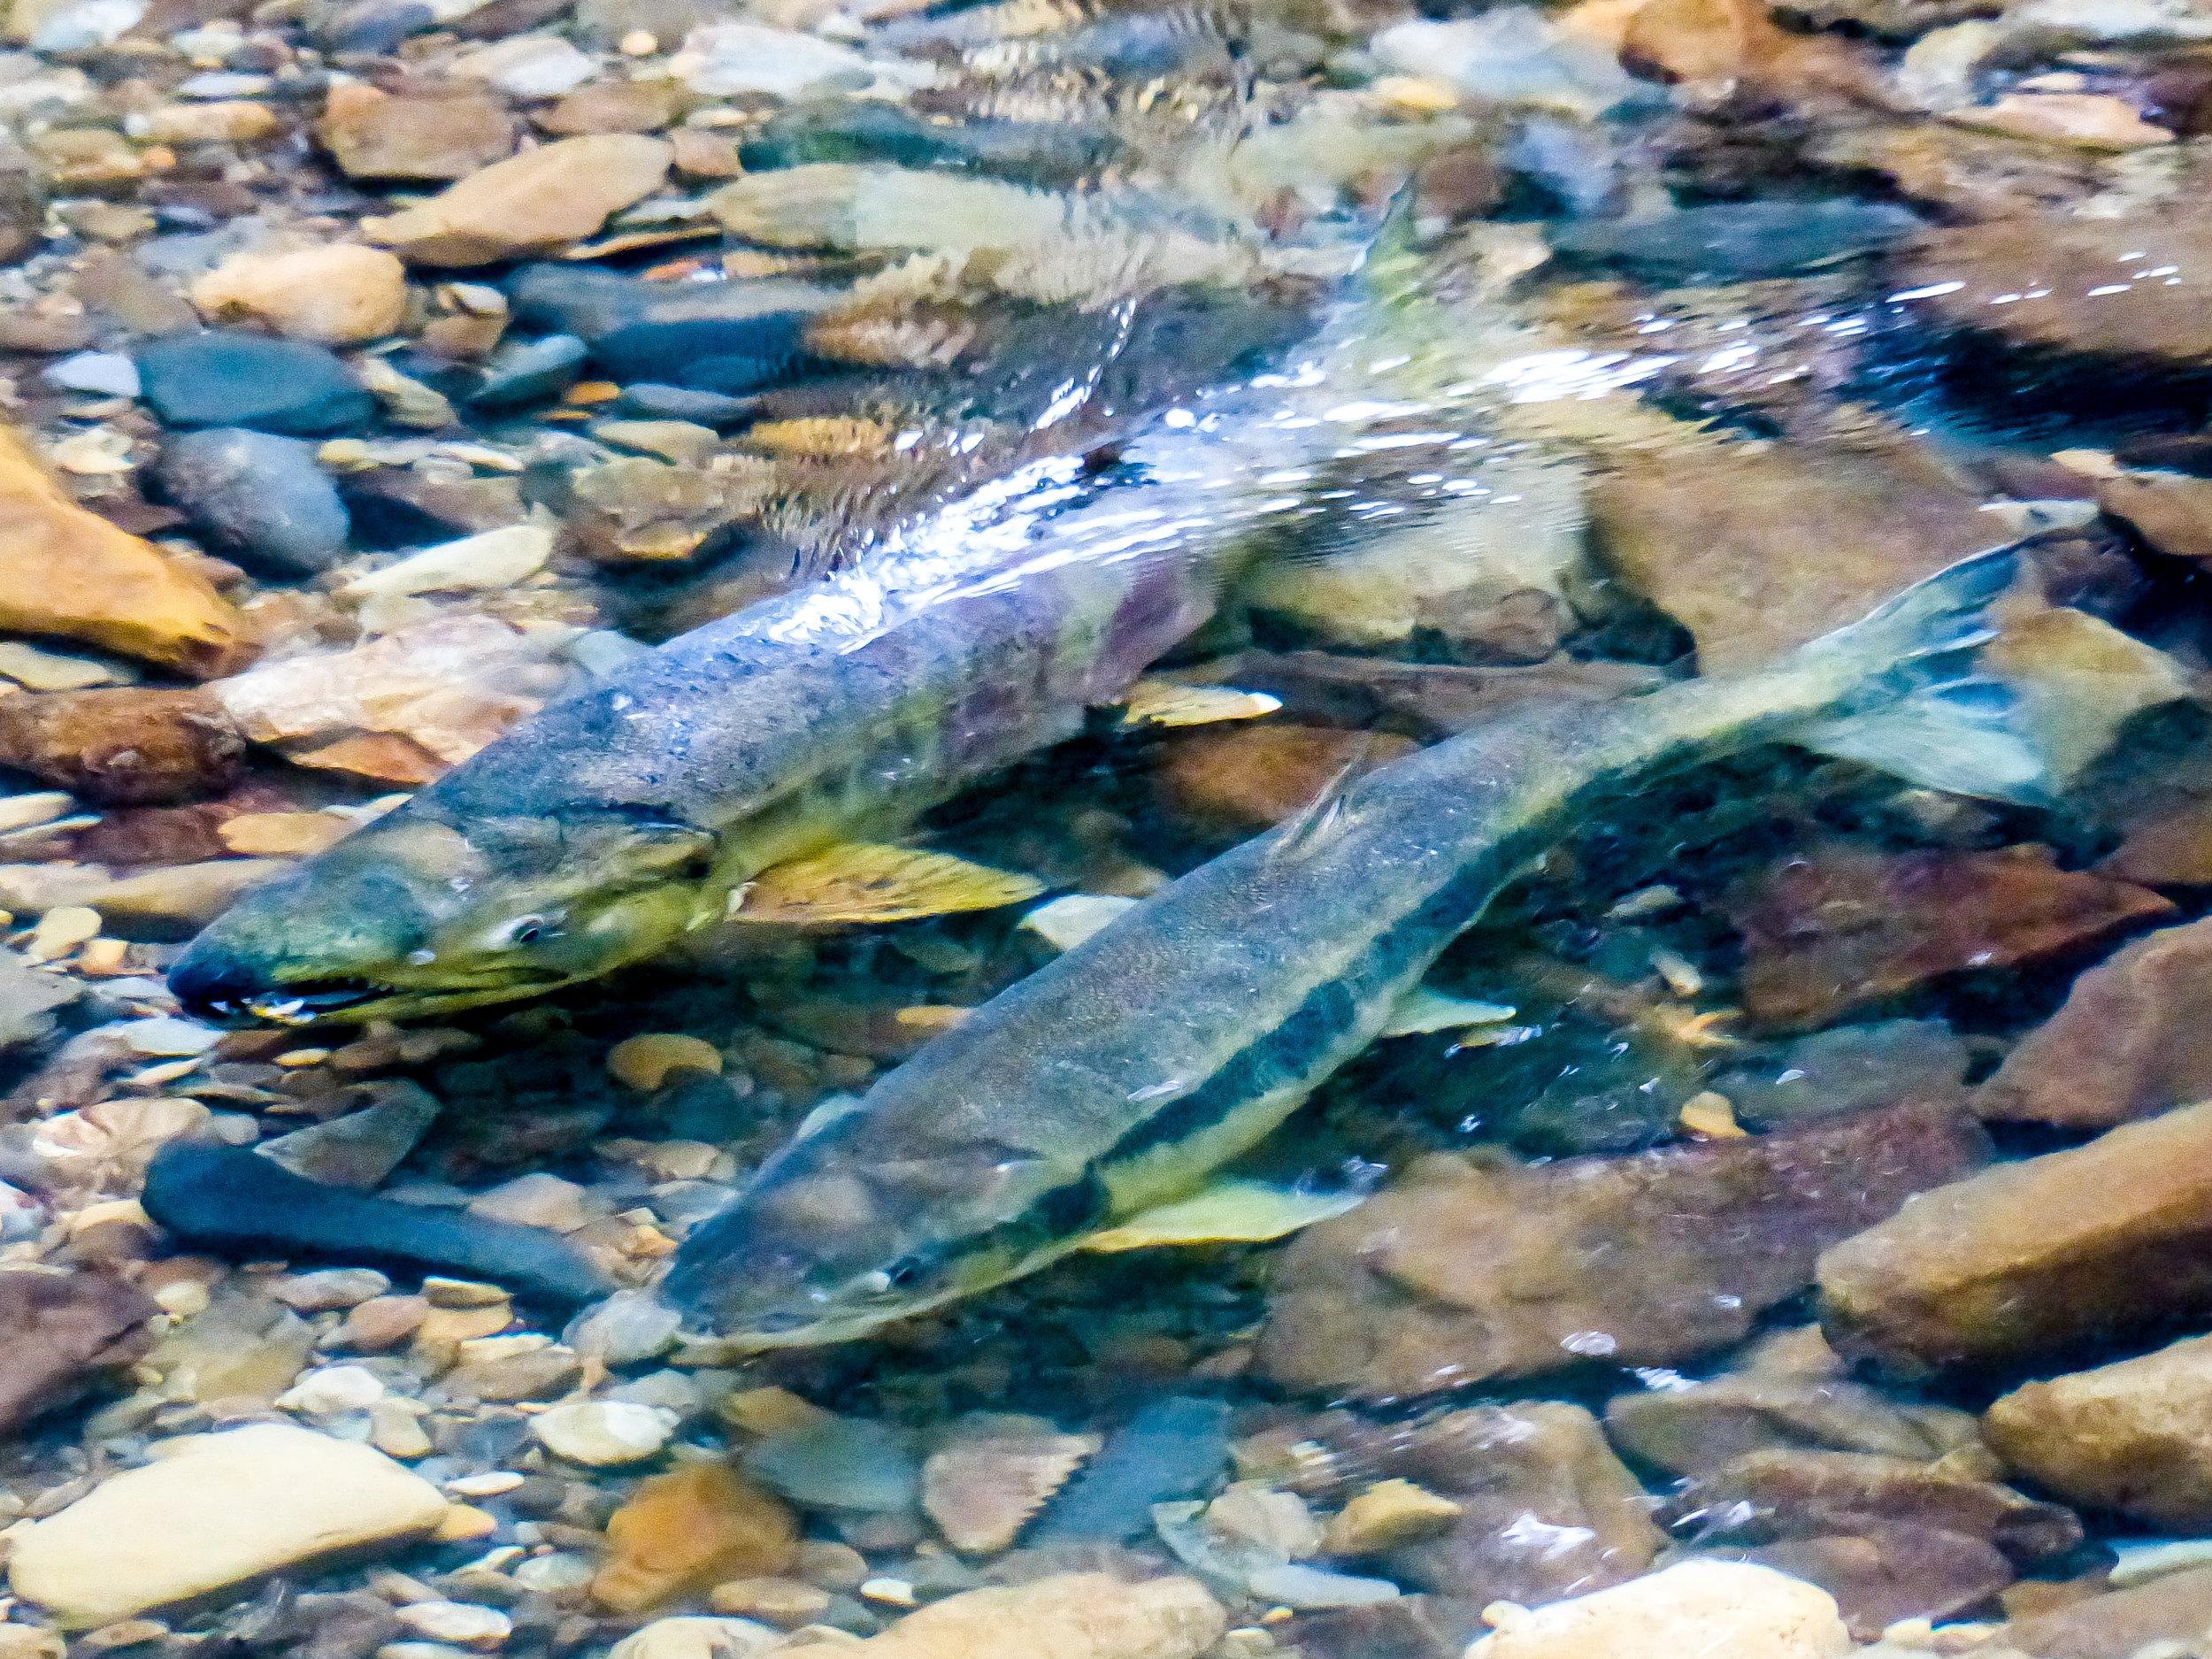 First run of chum salmon in Ellsworth Creek.Photo © David Ryan / The Nature Conservancy.